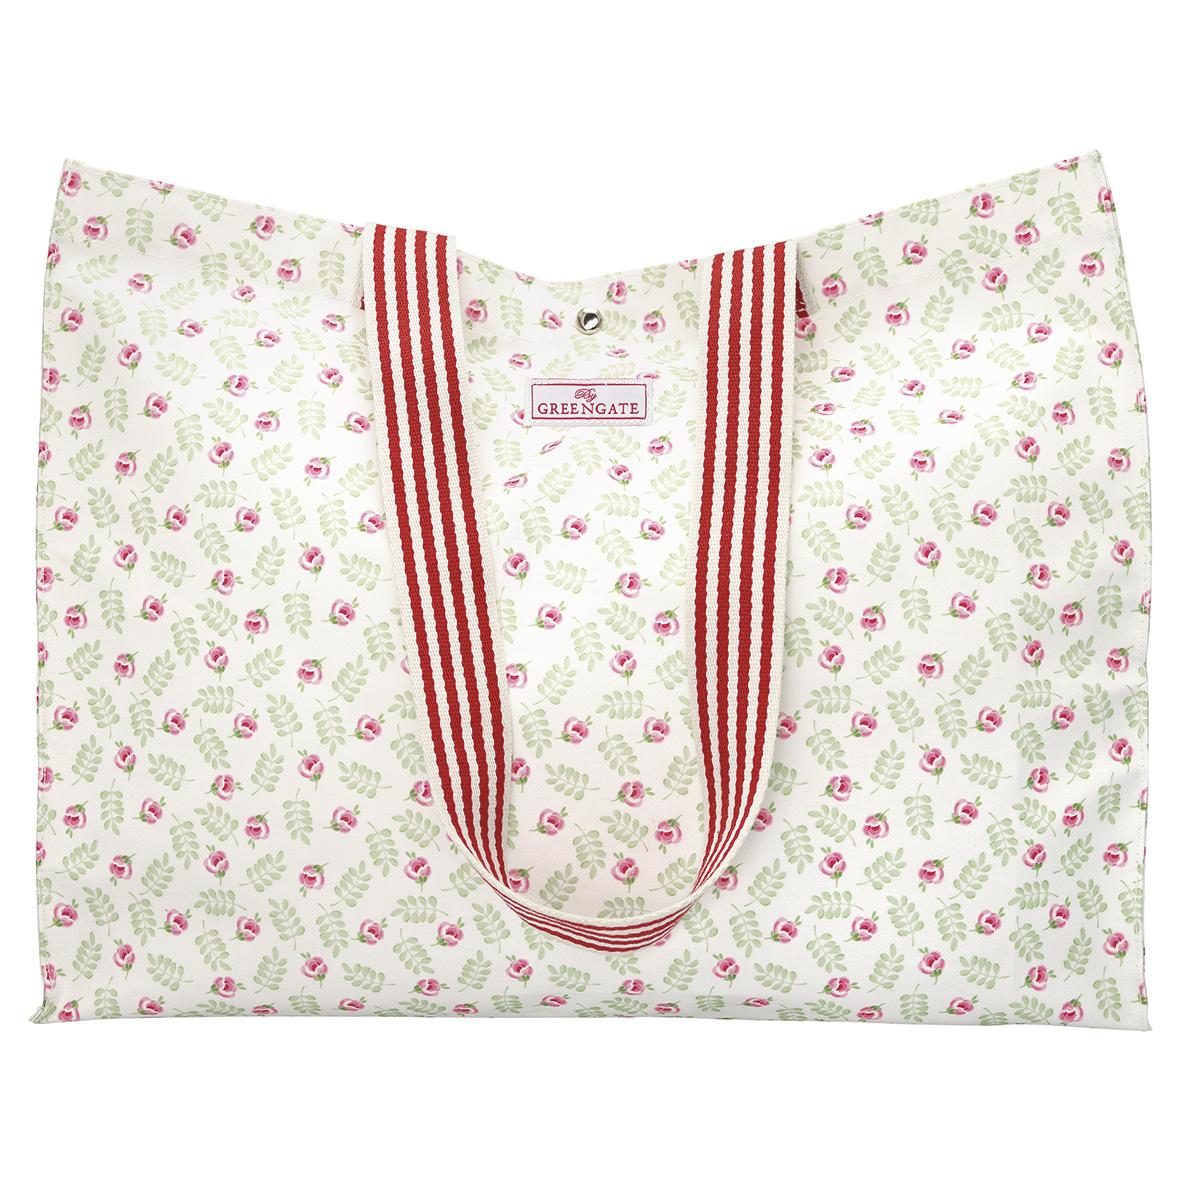 Shopper - Oilcloth Shopper - Lily petit white - Greengate